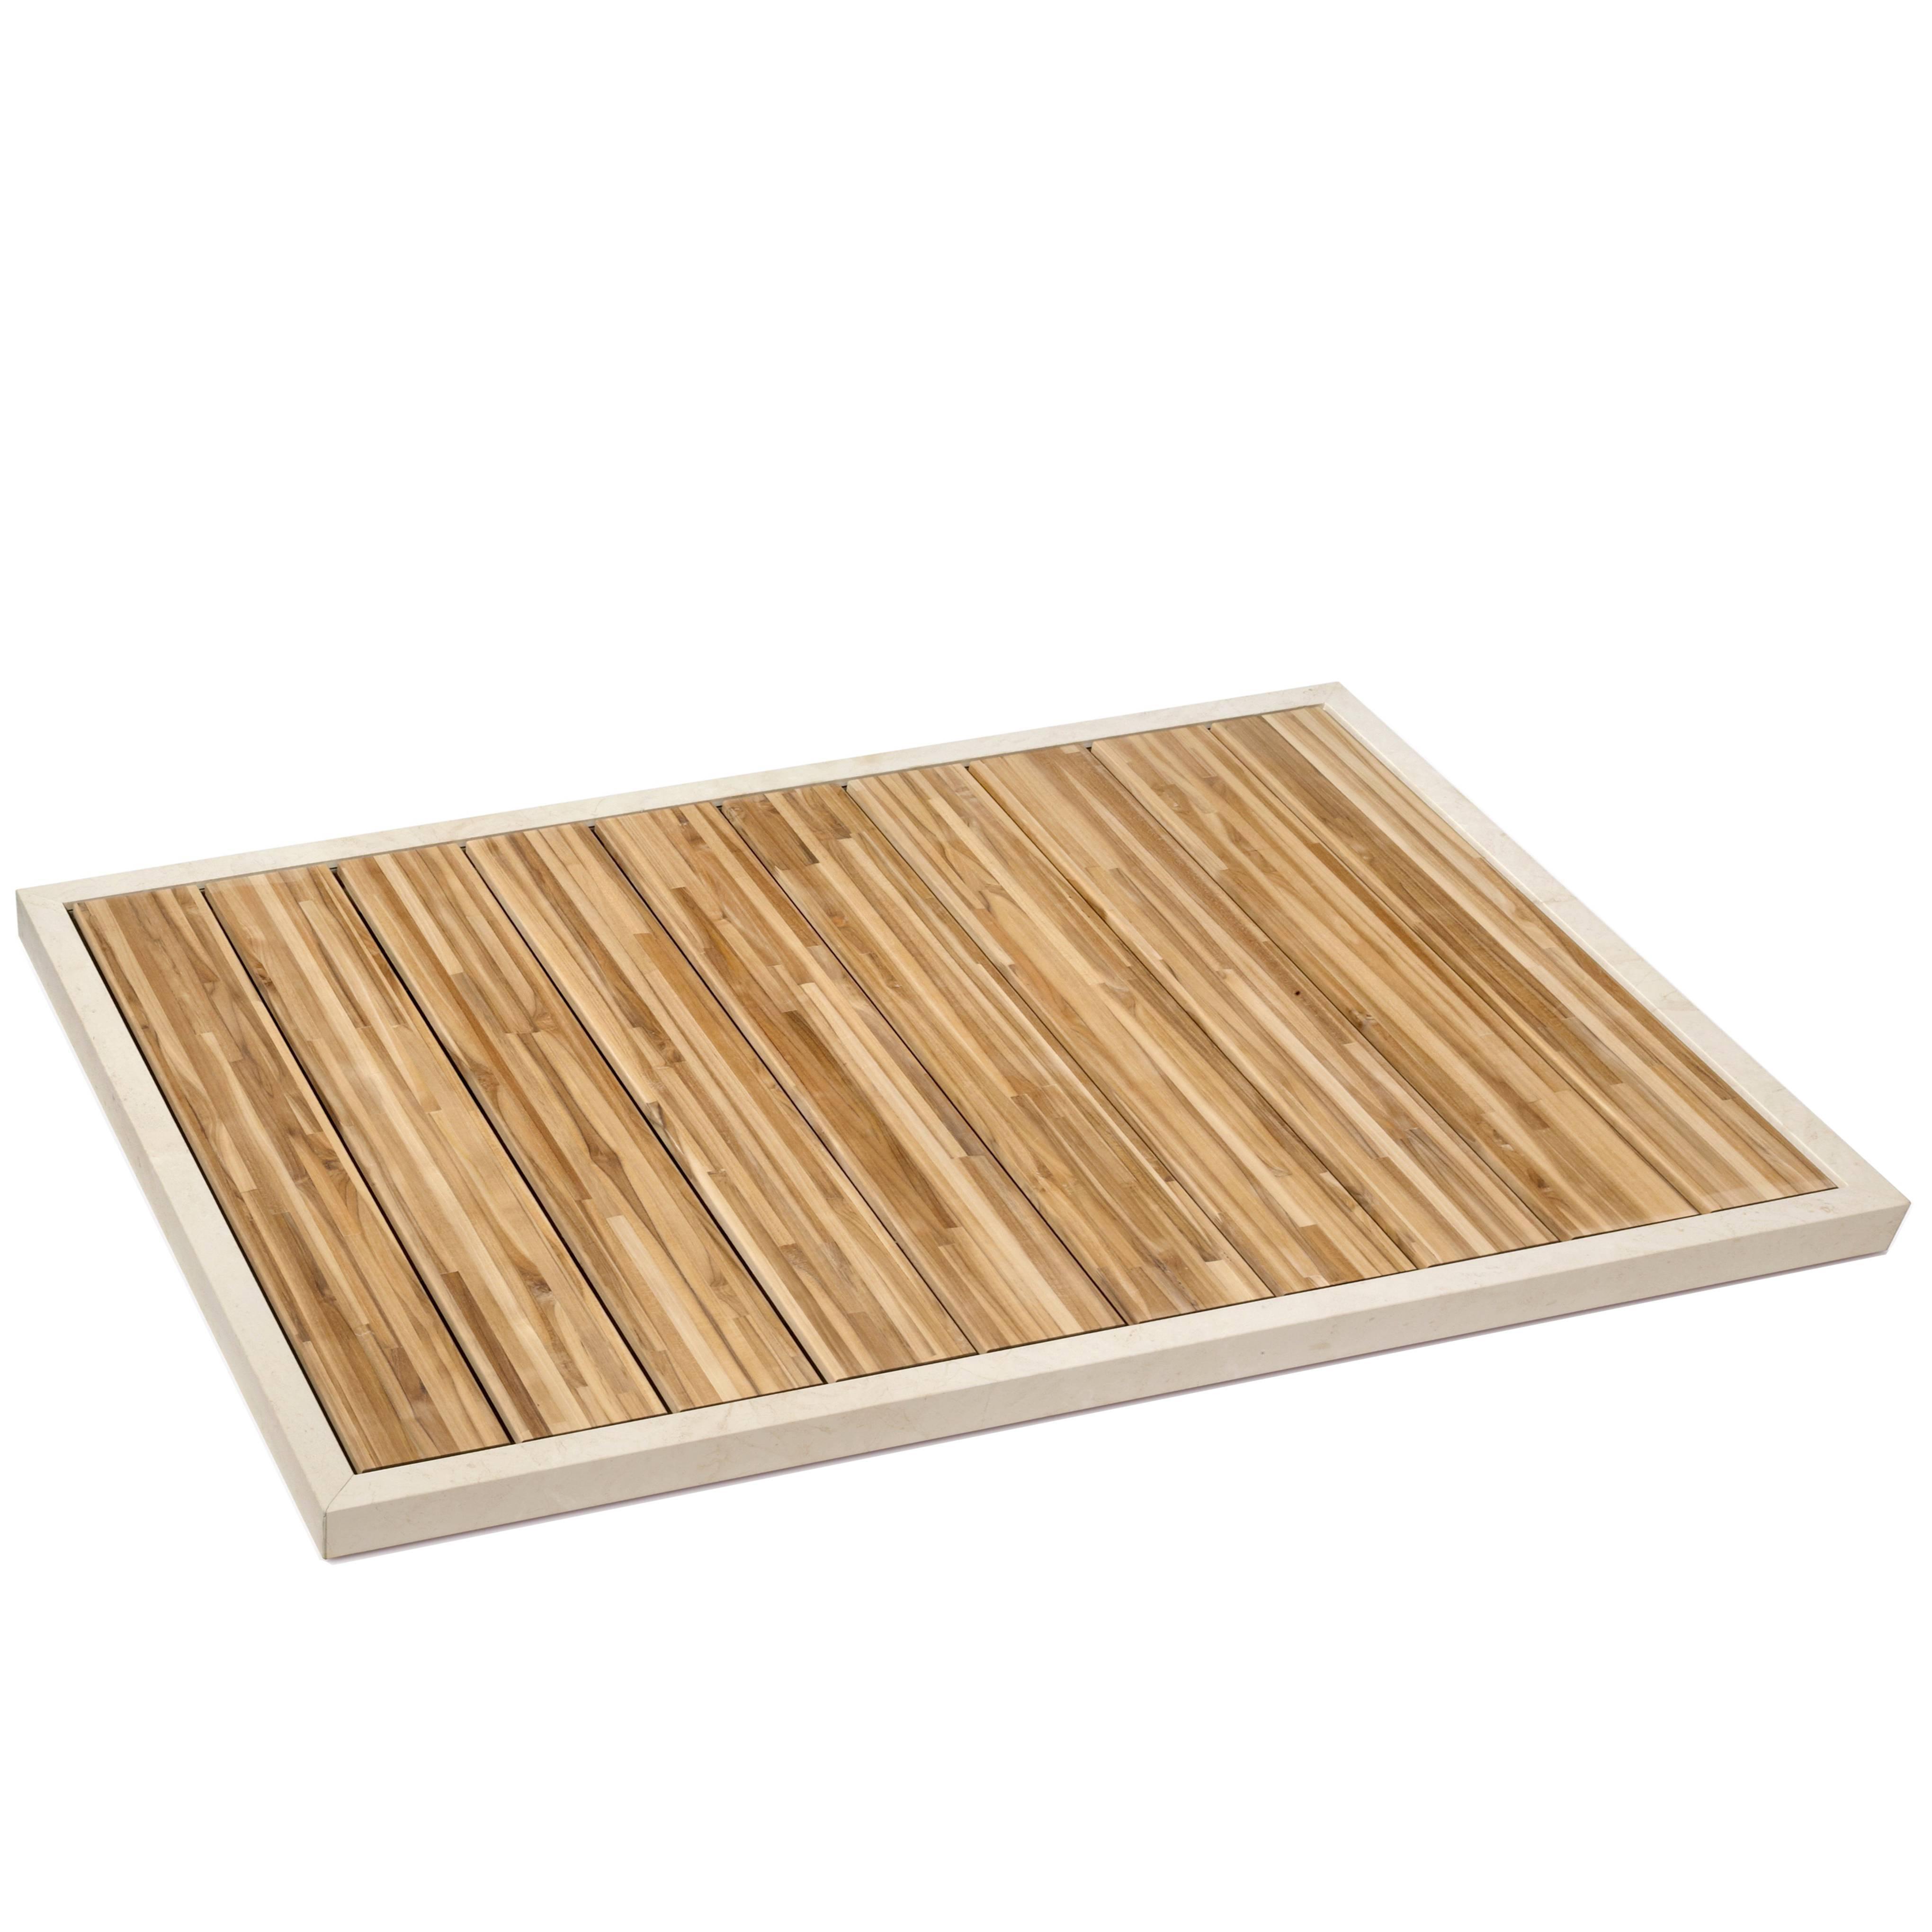 Salvatori Ishiburo Shower Tray In Crema Du0027Orcia U0026 Teak Wood By Kengo Kuma  For